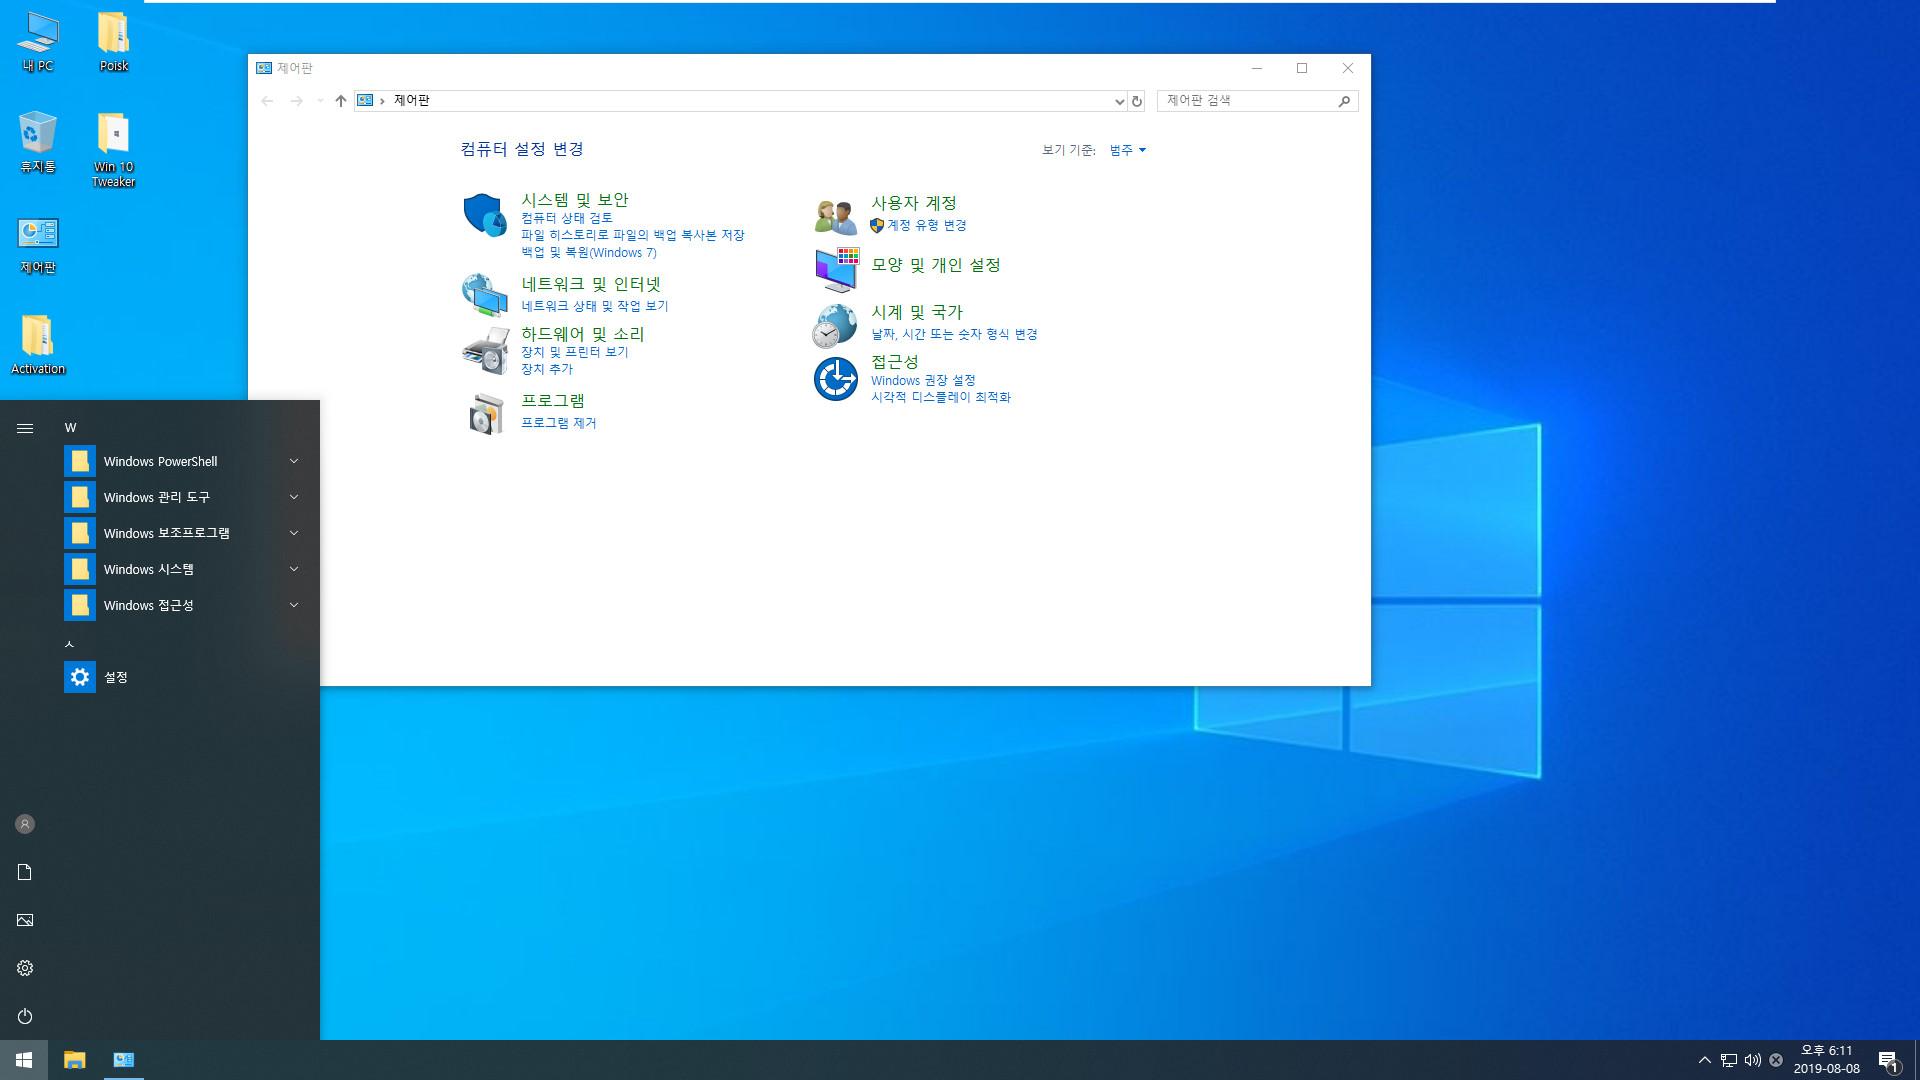 Windows 10 Enterprise x64 lite 1903 build 18362.267 by Zosma.iso - 러시아어 한글화 시도 - 그래서 그냥 원본대로 설치 후에 한글화 시도 2019-08-09_001136.jpg